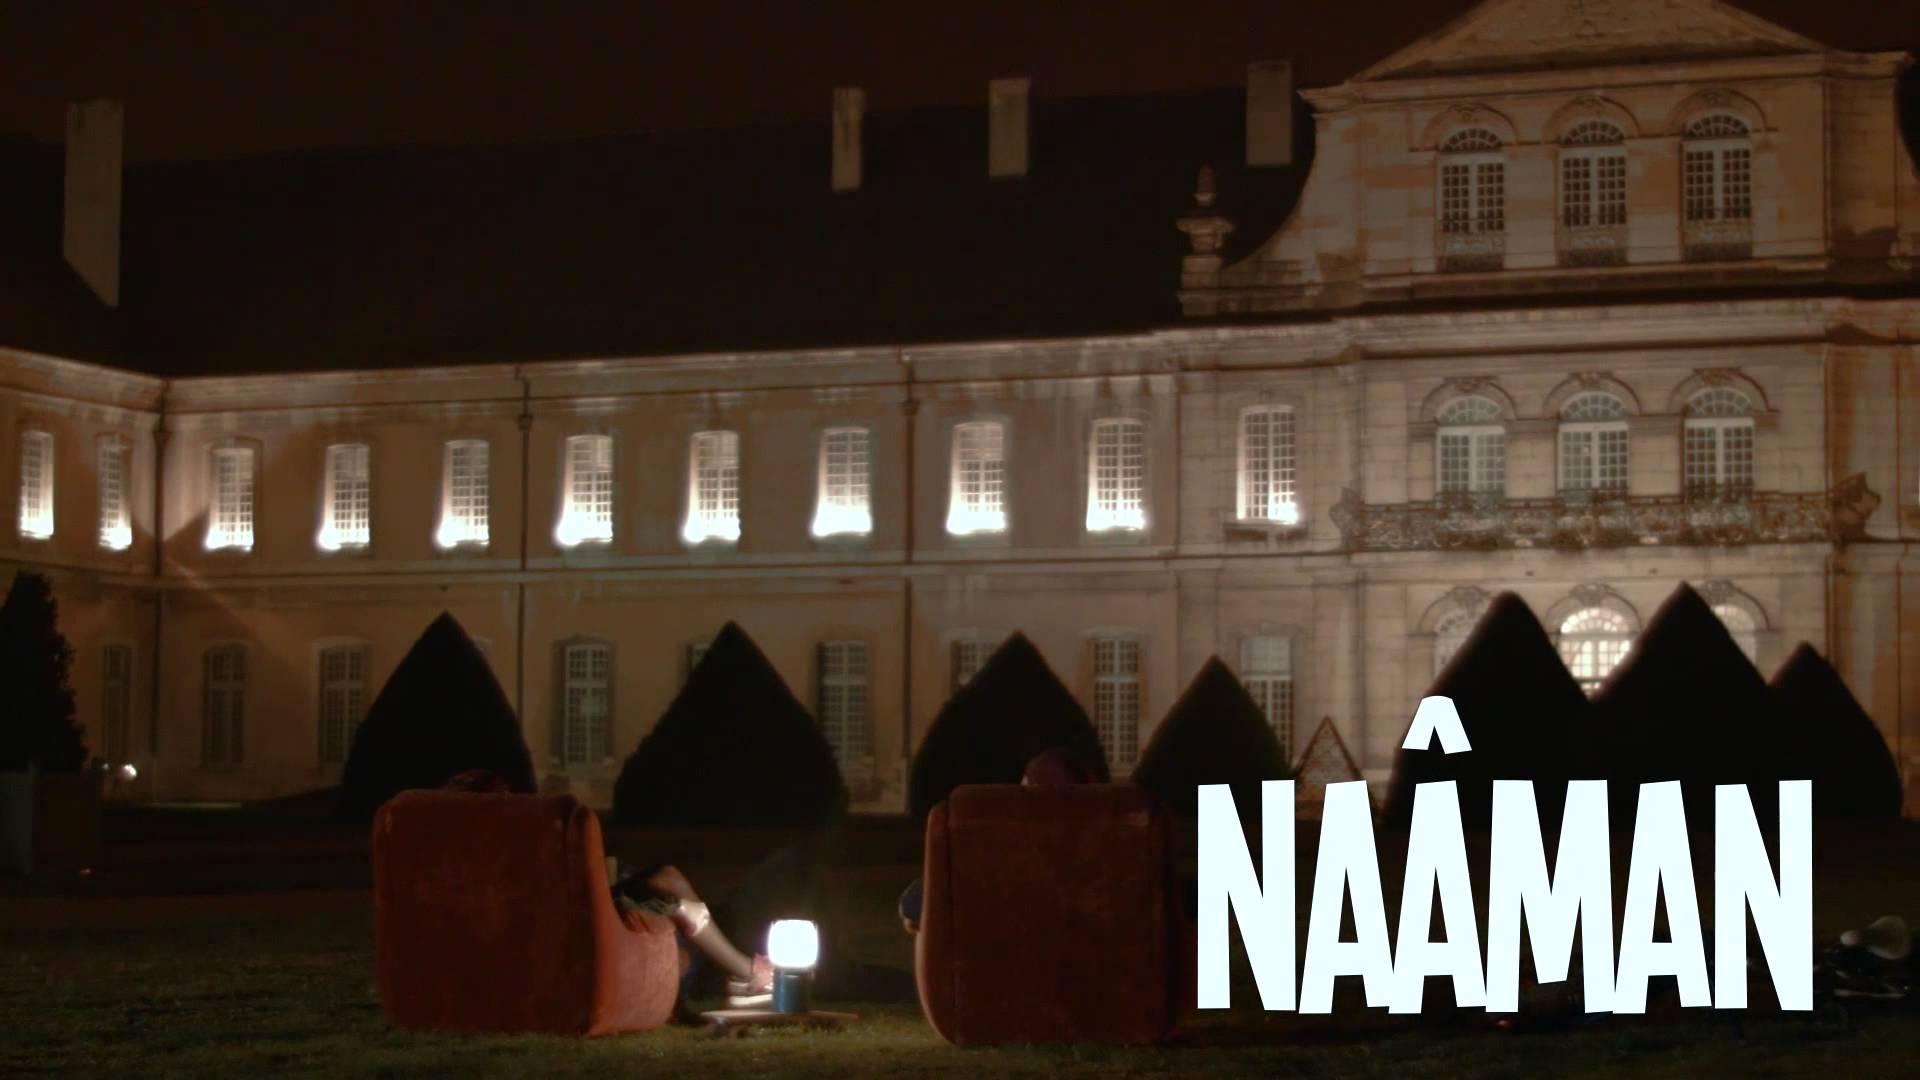 Festival Grand Bastringue Cluny 2015 (Teaser) [4/30/2015]